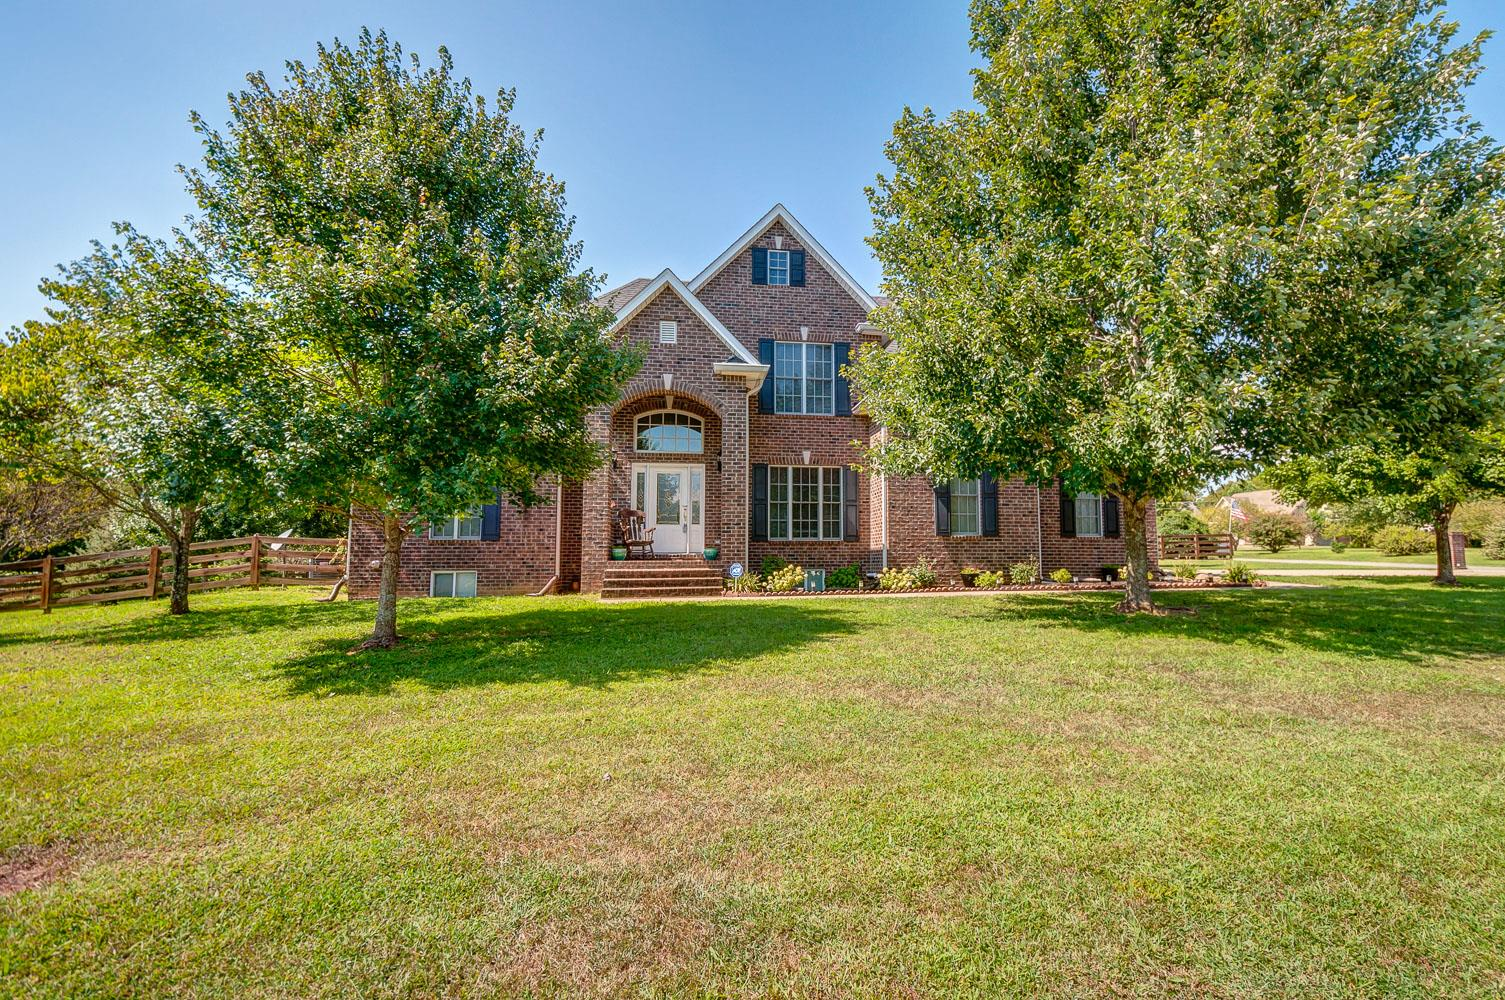 1001 Arbor Dr, Castalian Springs, TN 37031 - Castalian Springs, TN real estate listing